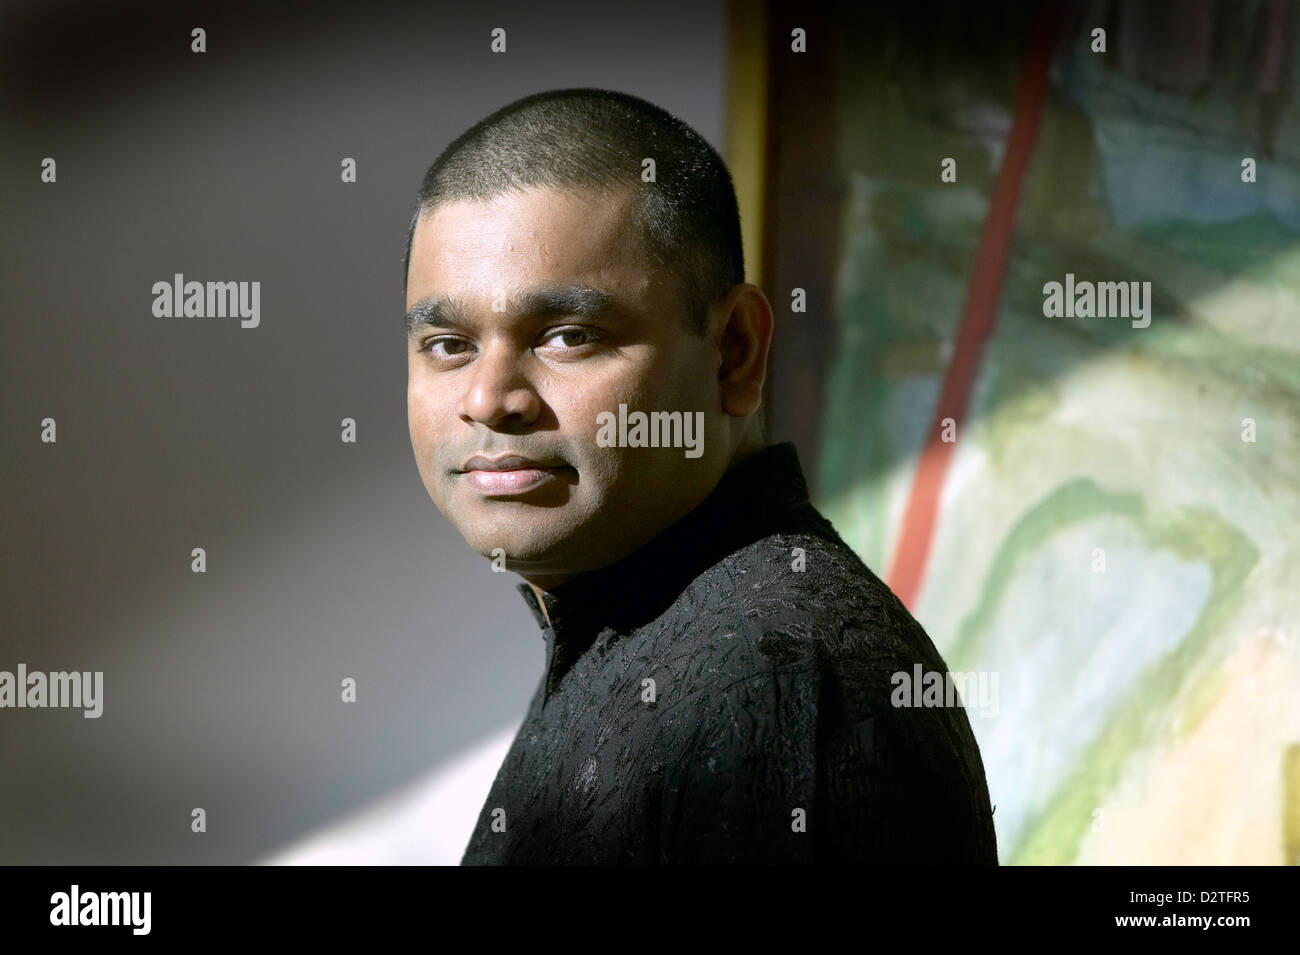 A R Rahman Stock Photos & A R Rahman Stock Images - Alamy